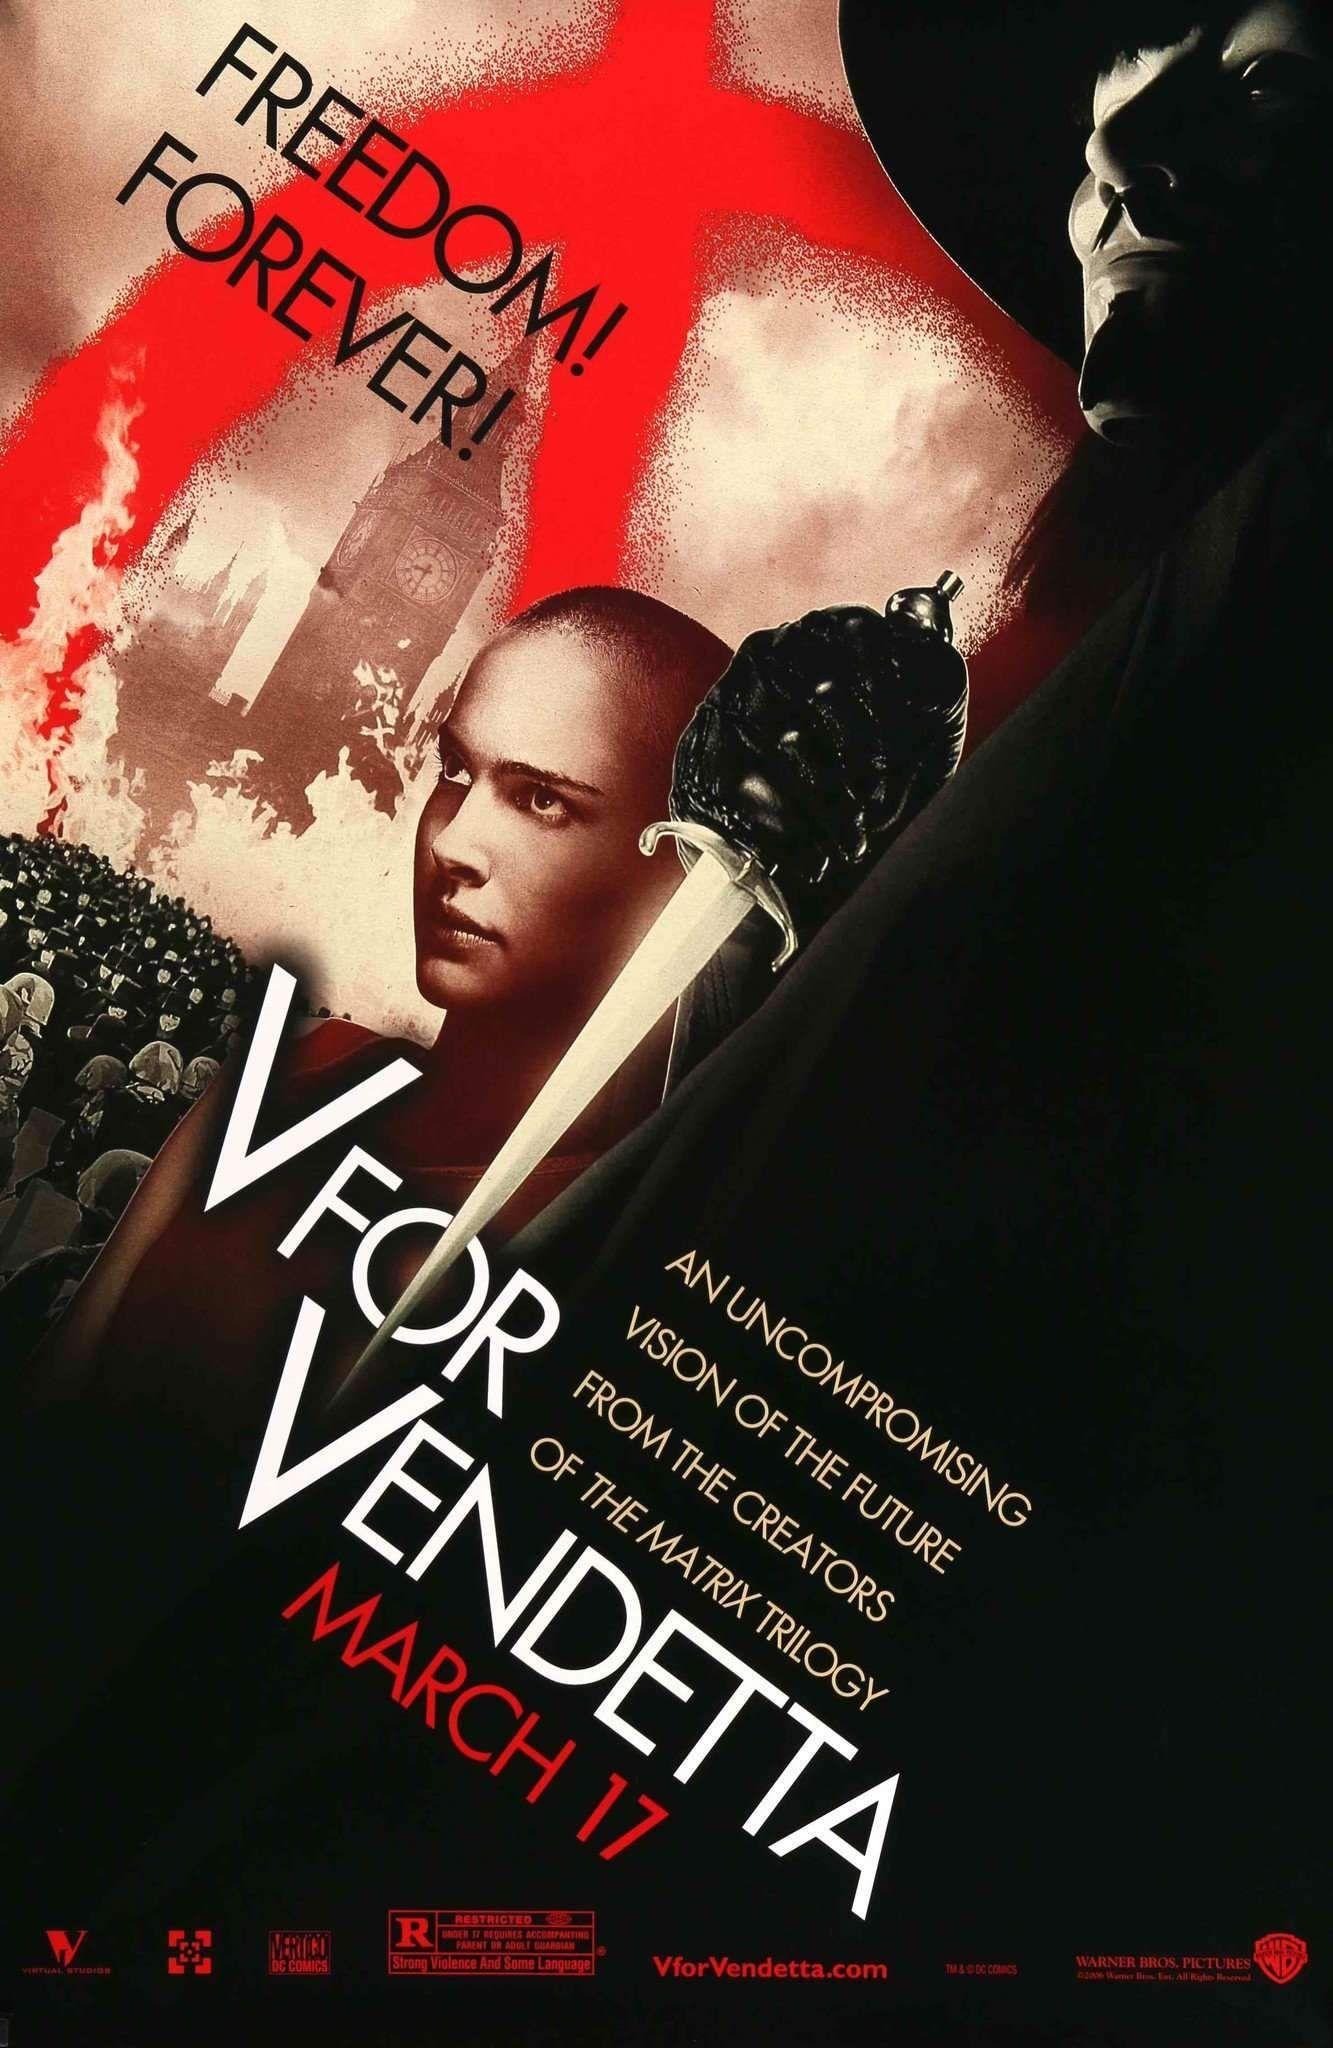 V For Vendetta (2006) V for vendetta, V for vendetta